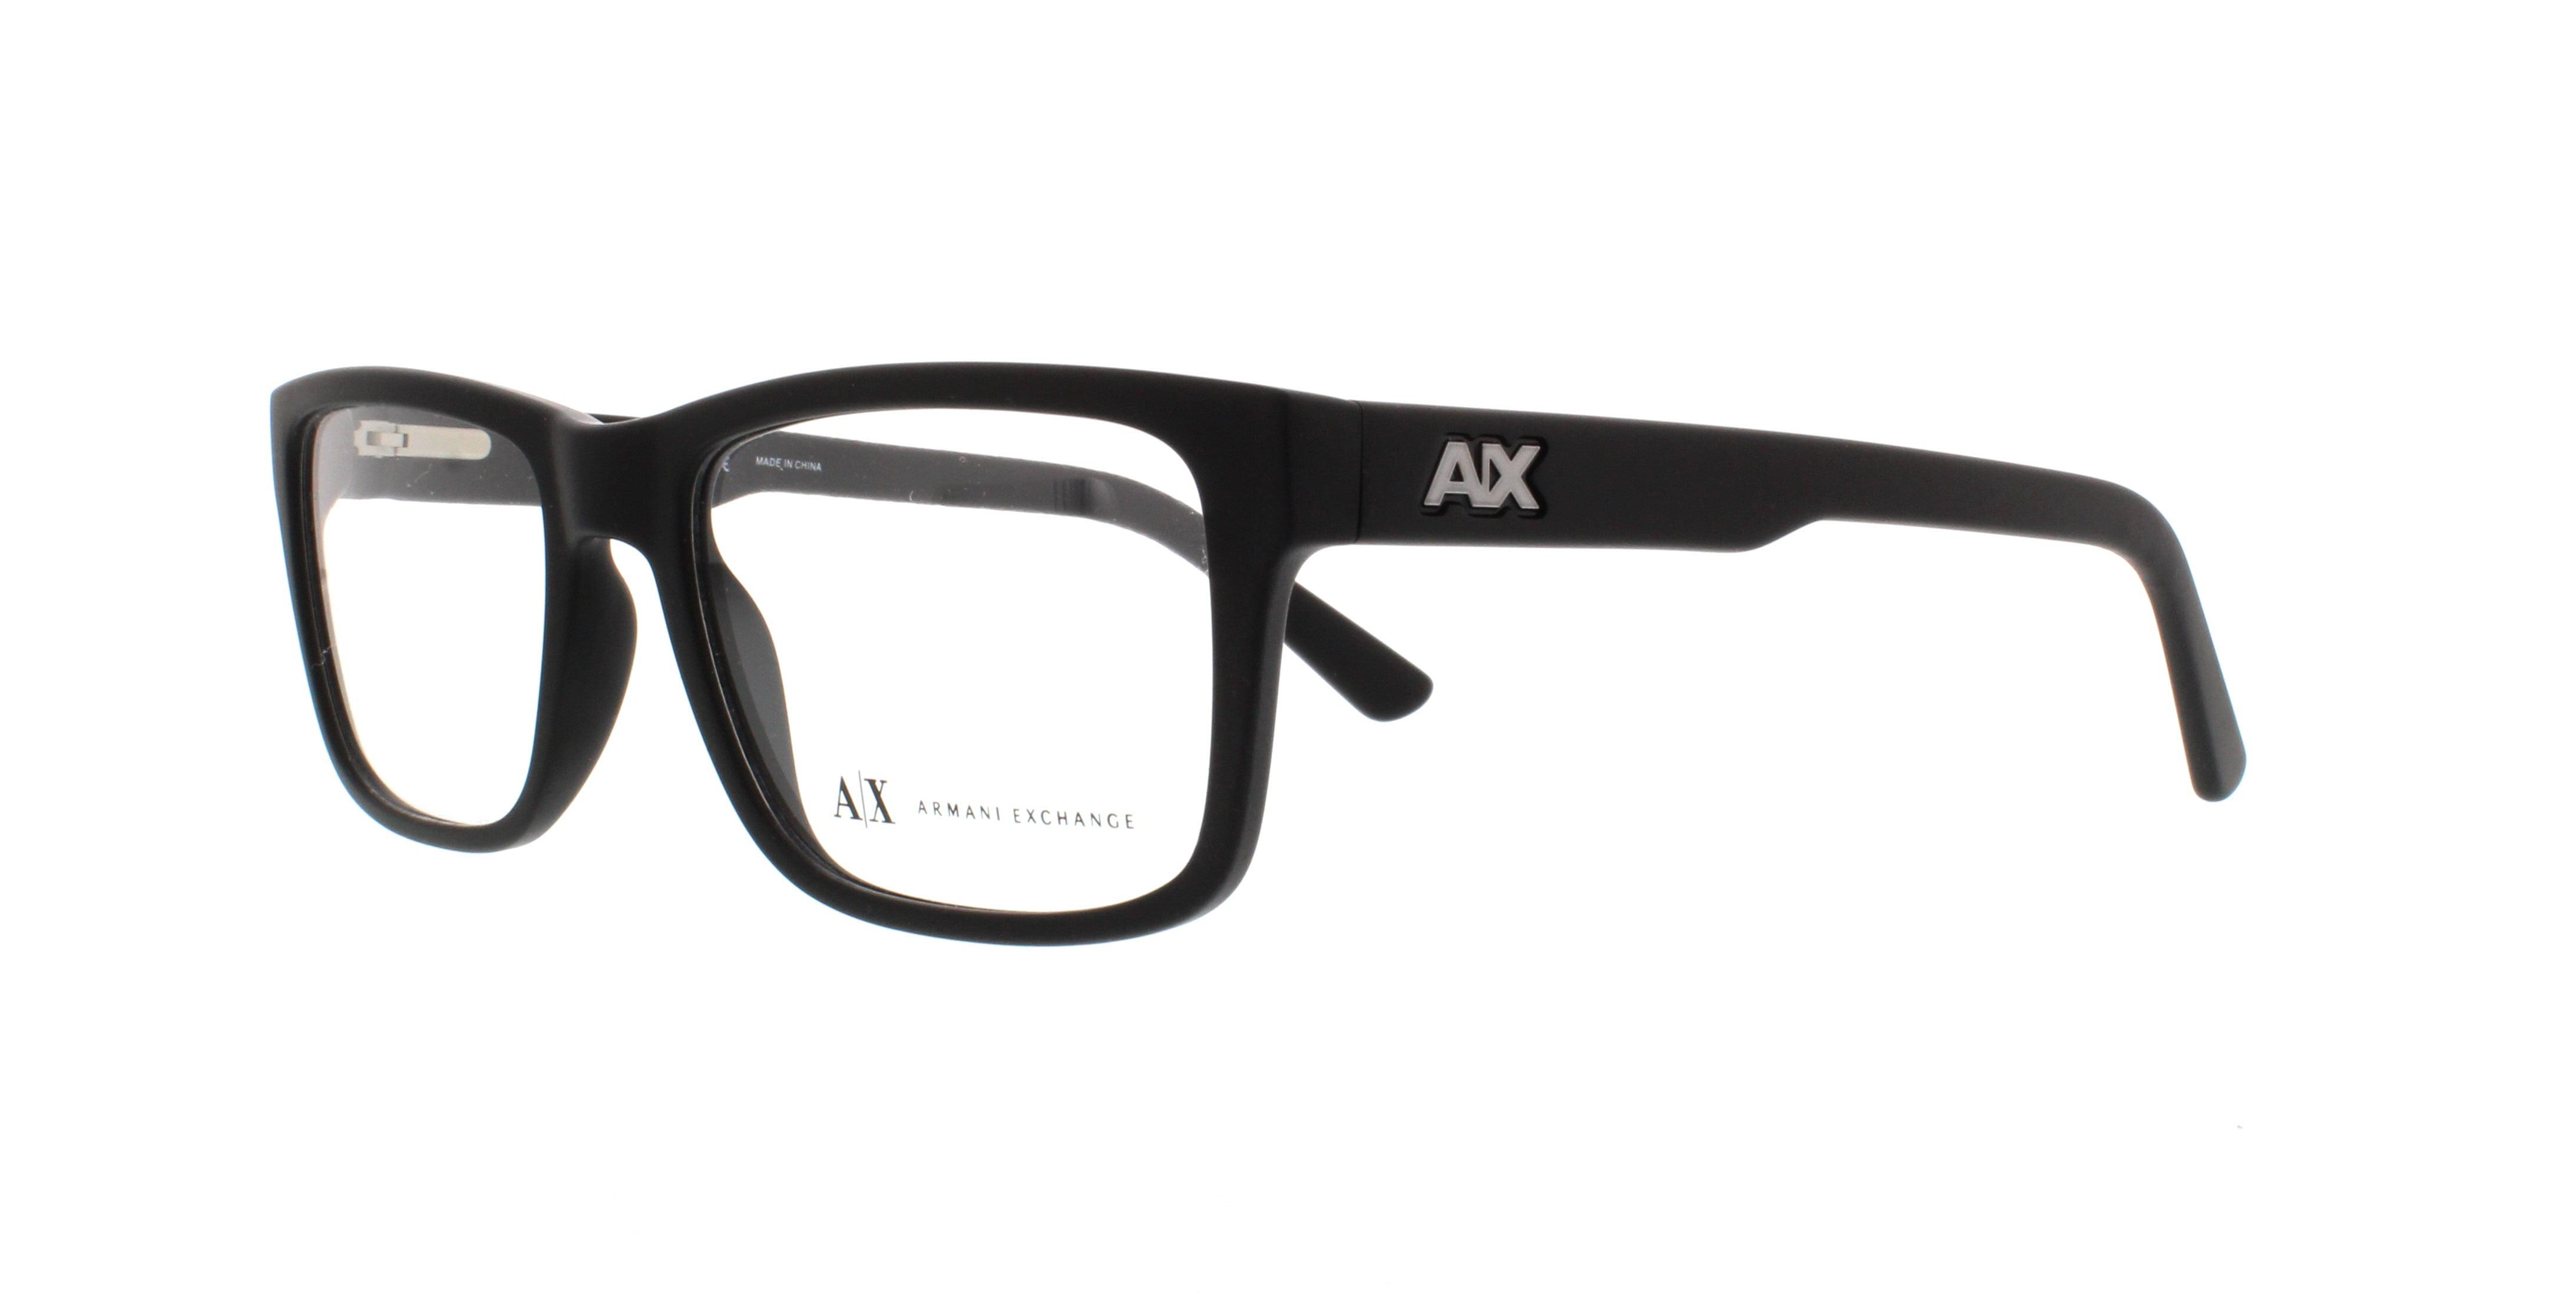 6258856d30 ARMANI EXCHANGE Eyeglasses AX3016 8078 Matte Black 53MM - Walmart.com